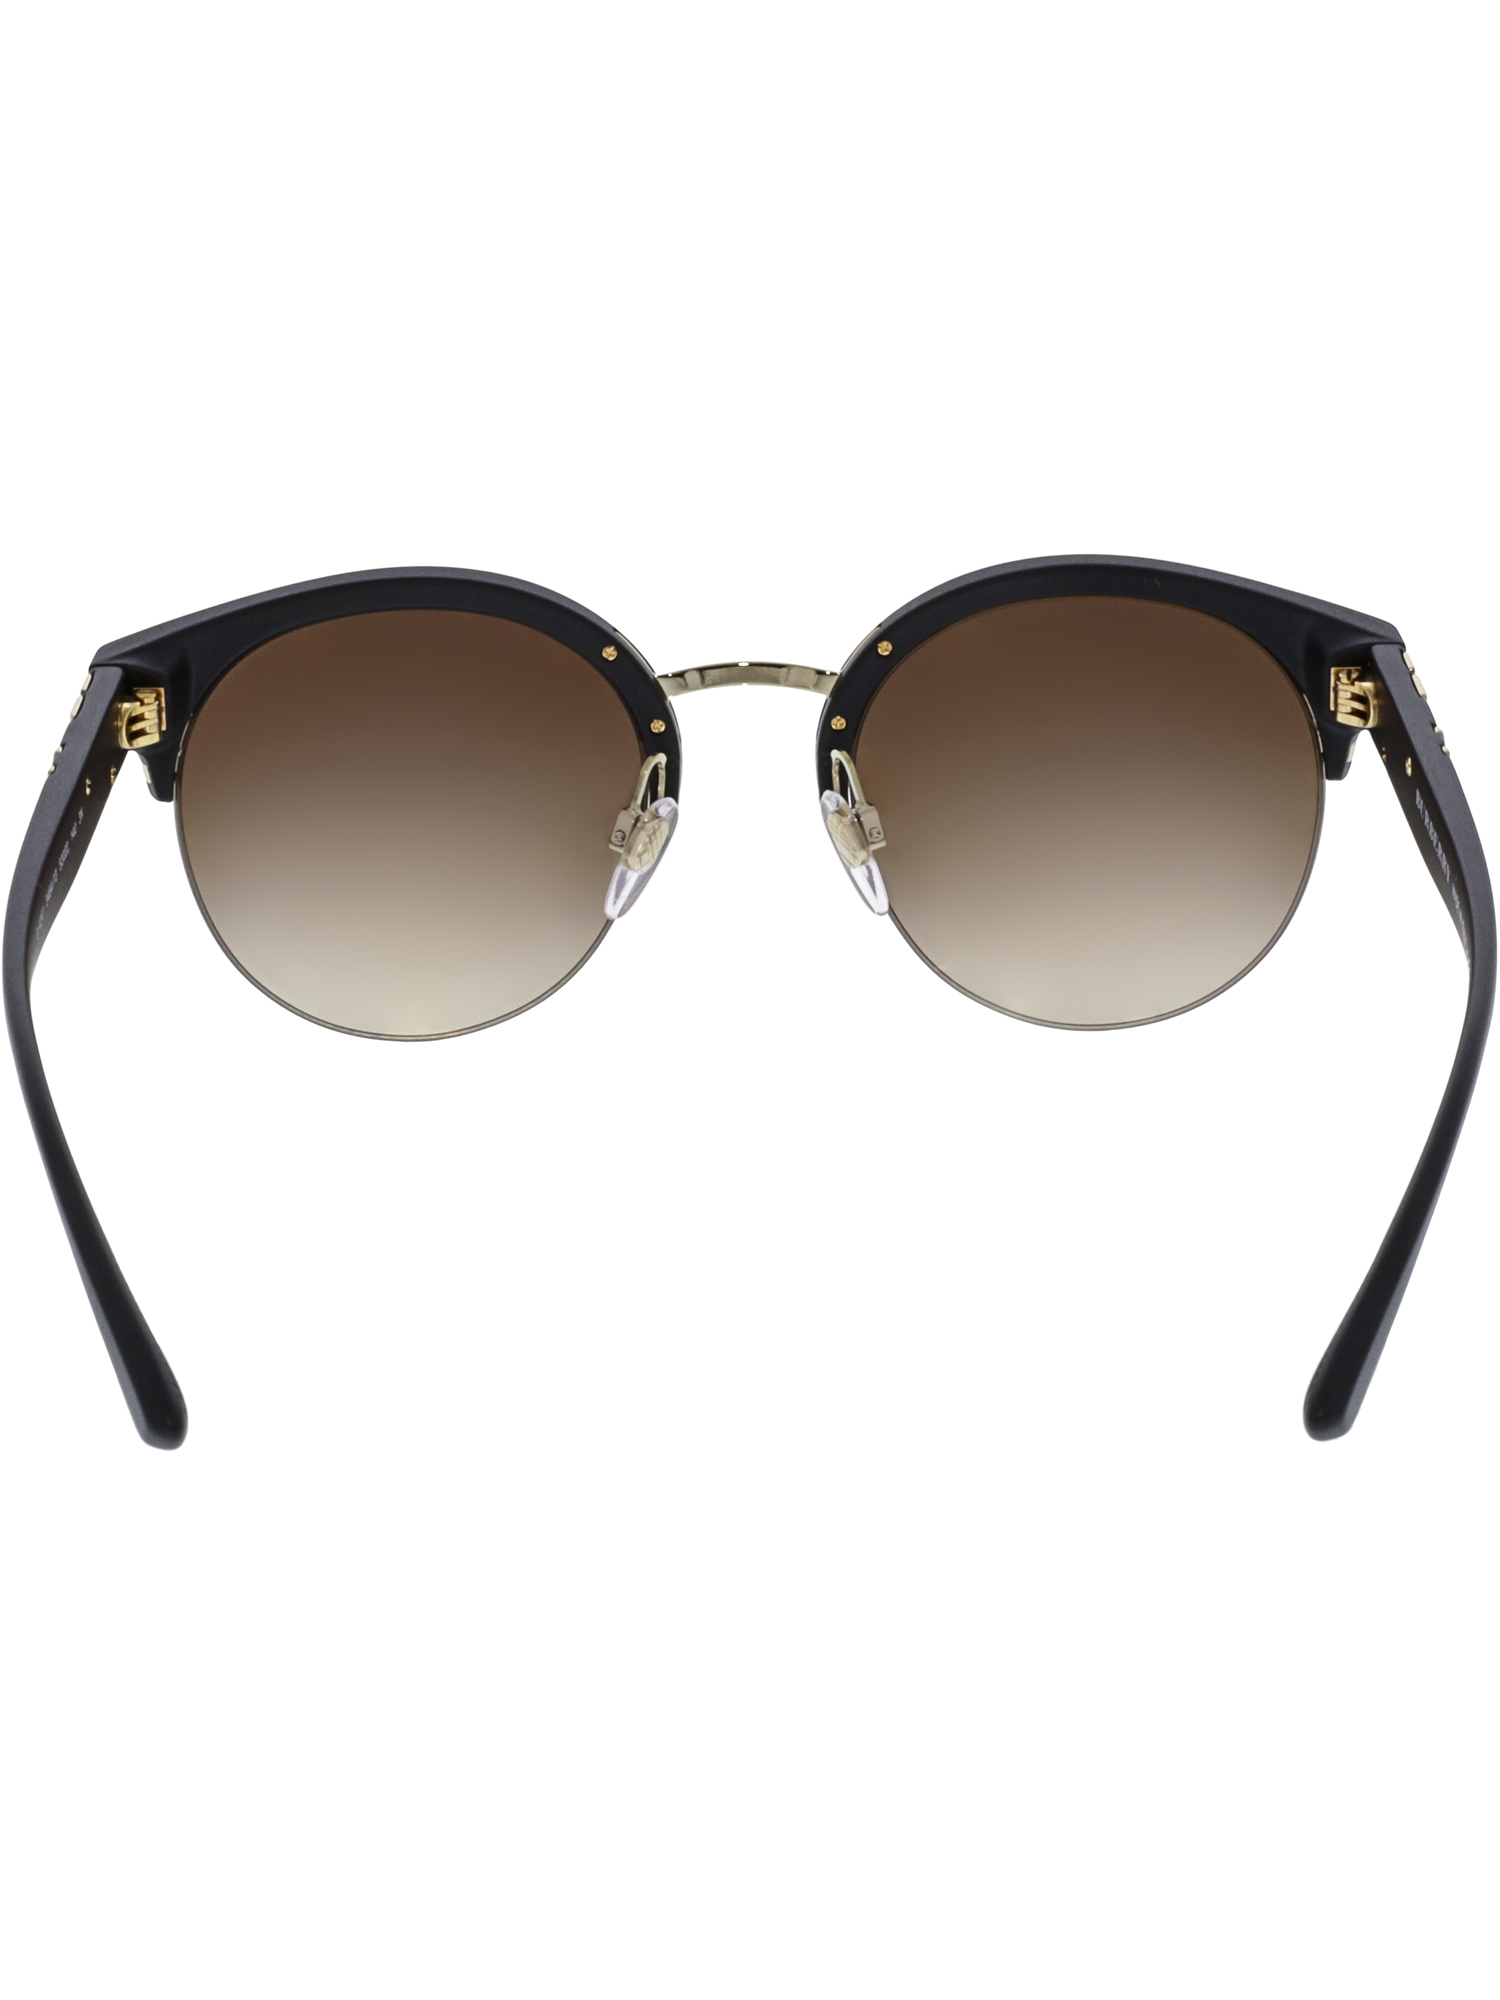 55abead06f2 Burberry - Burberry Women s Gradient BE4241-346413-52 Black Semi-Rimless  Sunglasses - Walmart.com